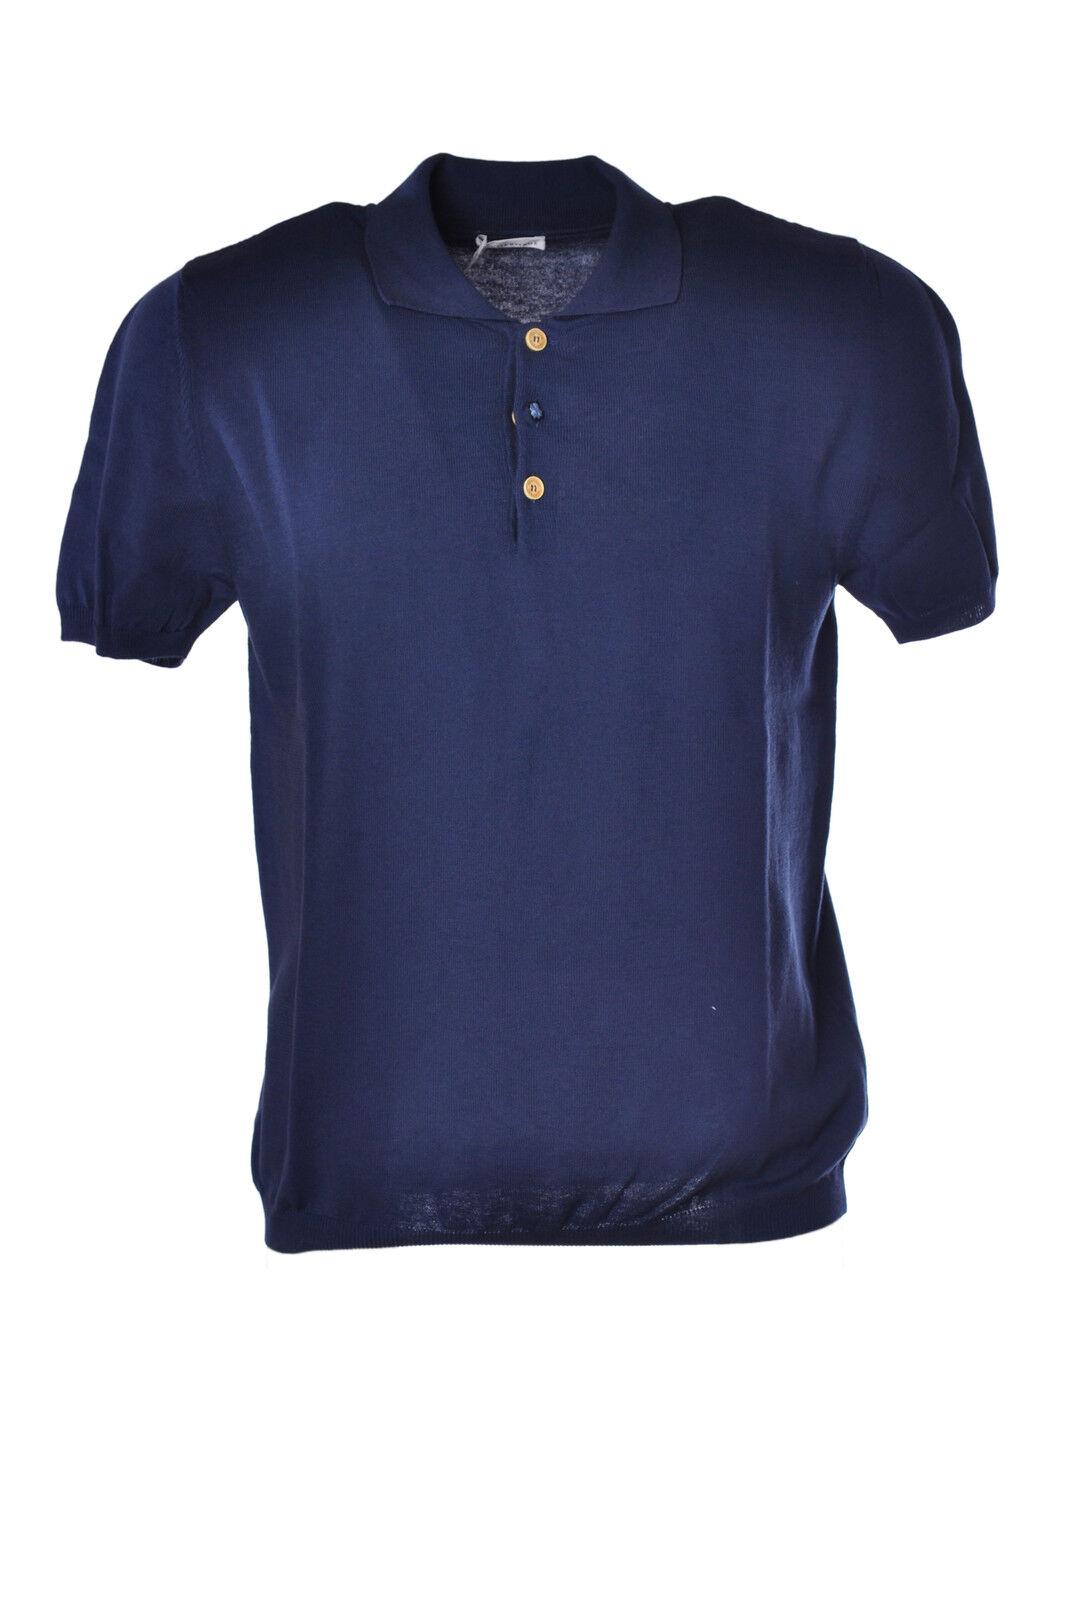 Heritage  -  Polo - Male - 48 - bluee - 1743118C162842